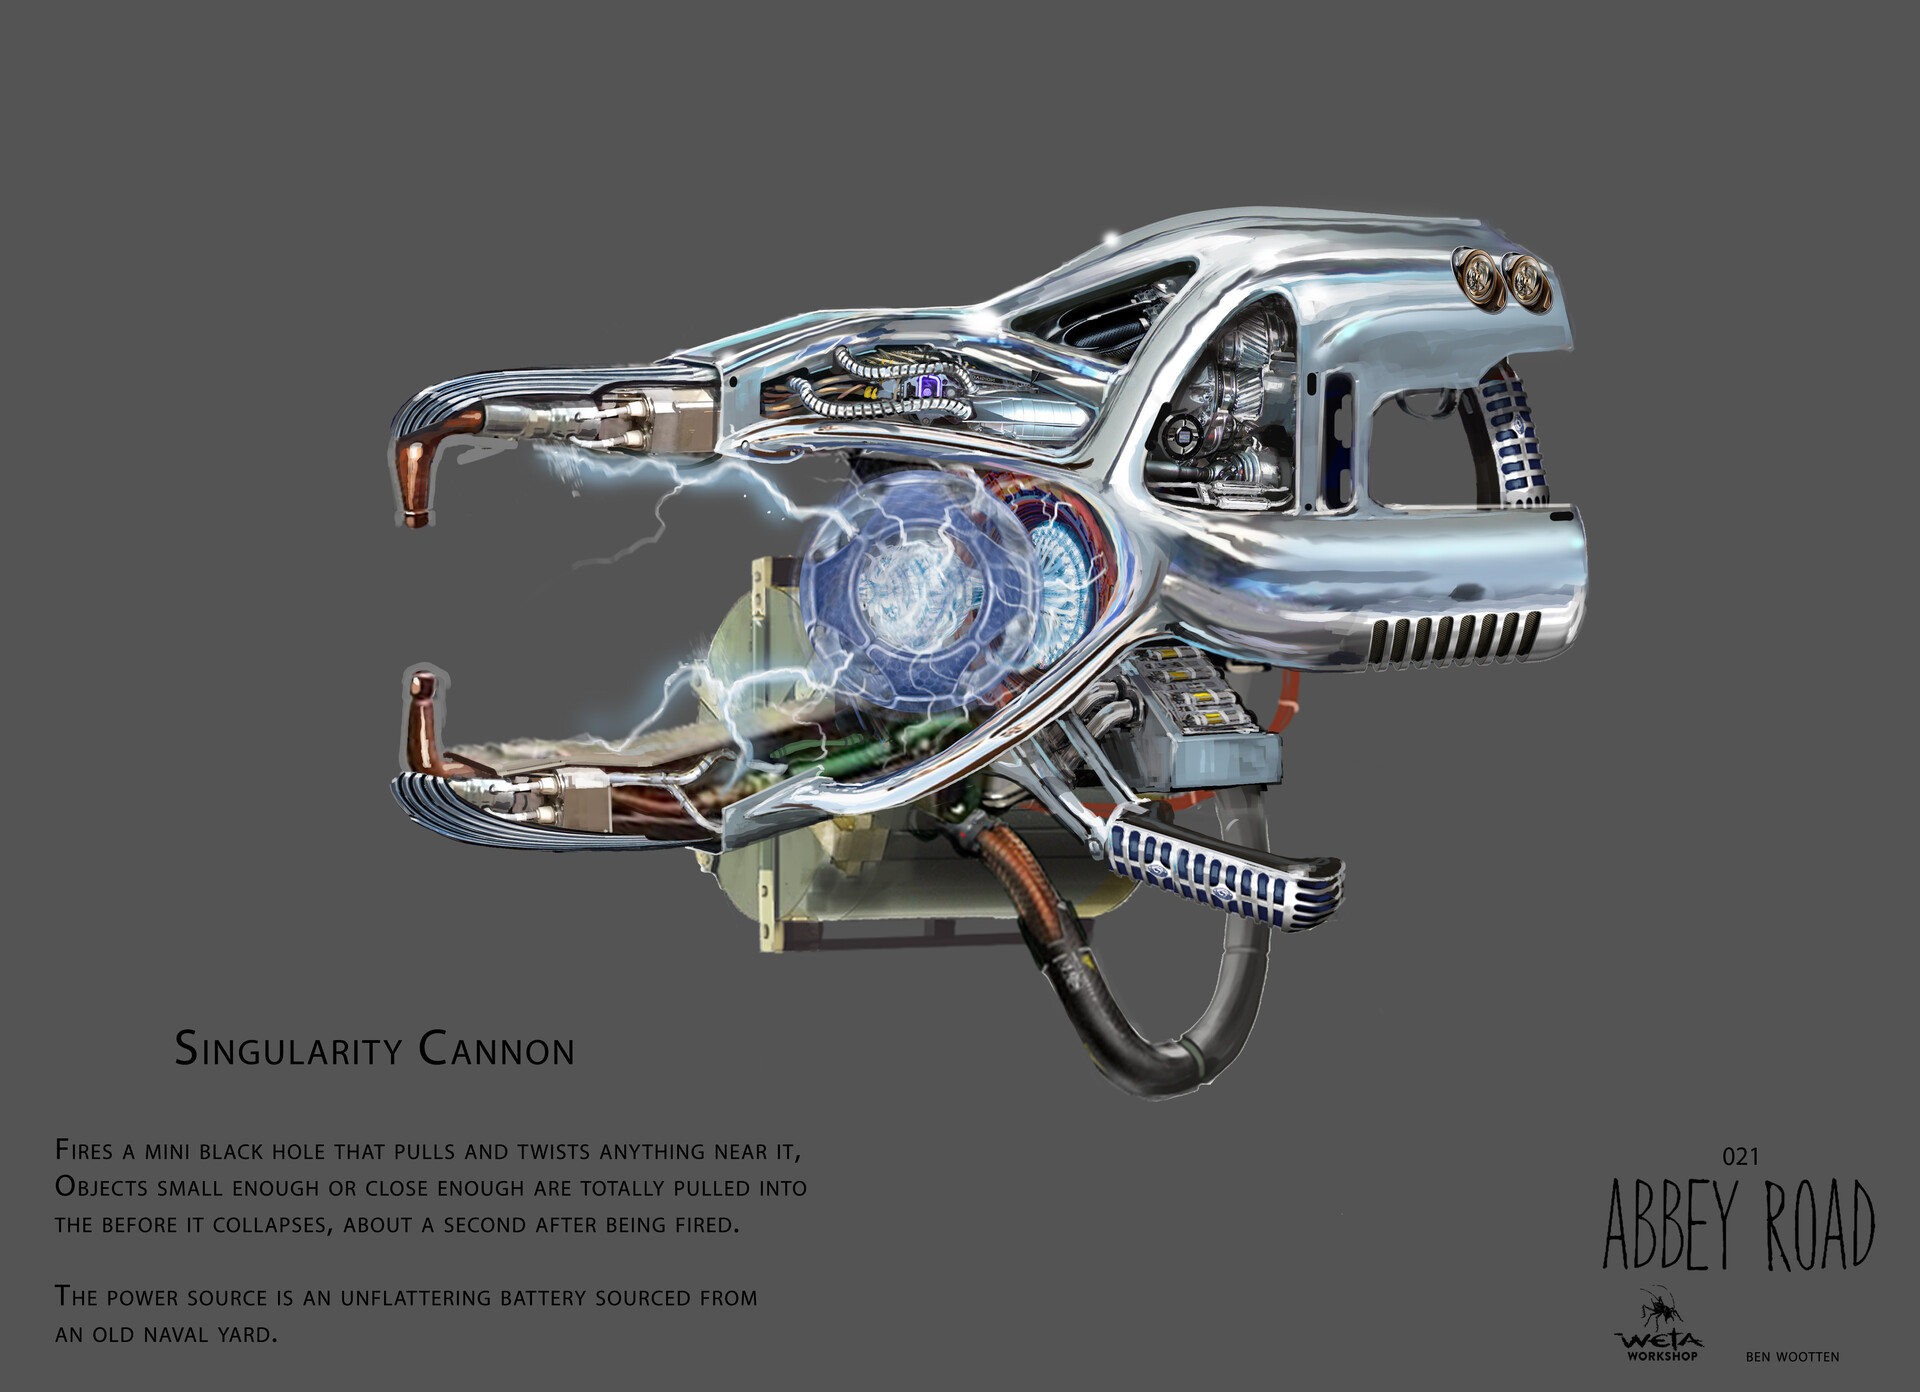 Singularity Cannon - Artist: Ben Wootten